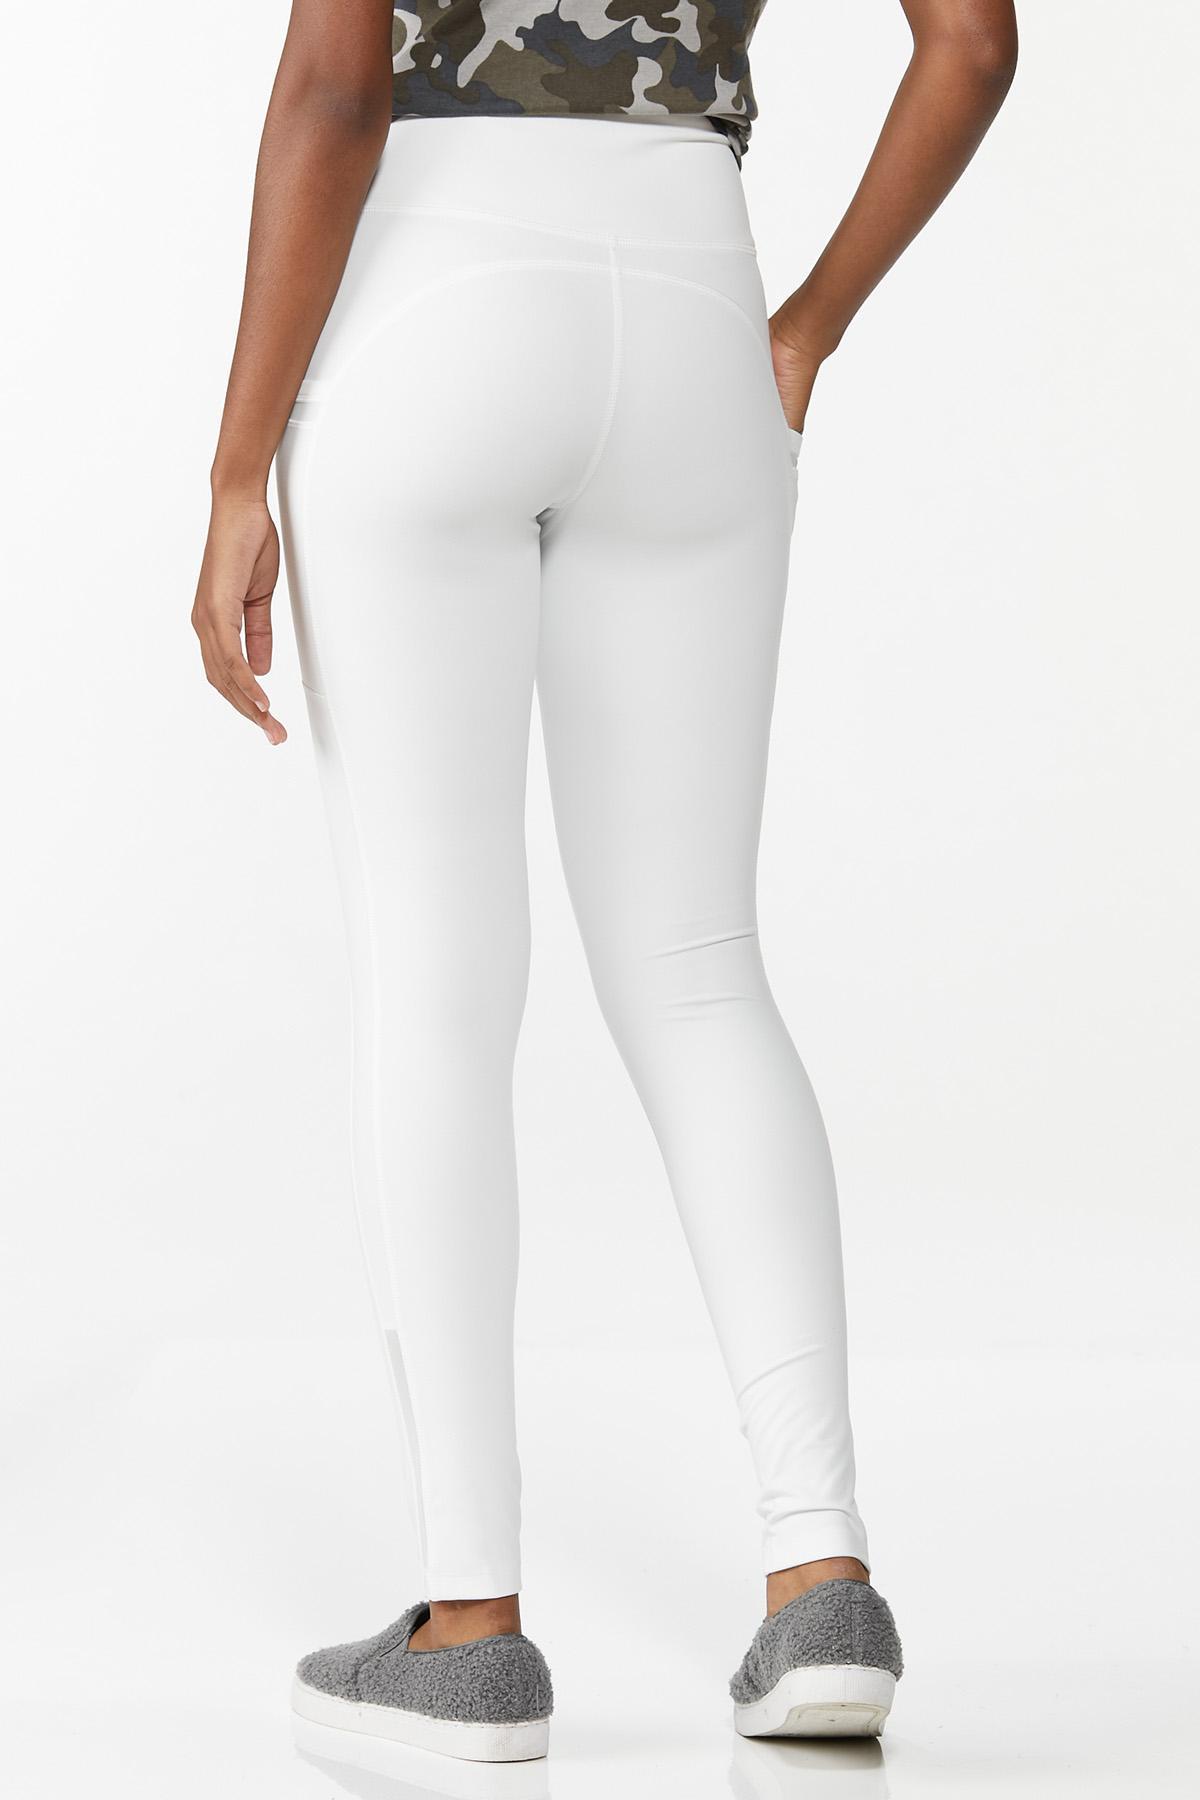 Mesh Pocket Leggings (Item #44660931)